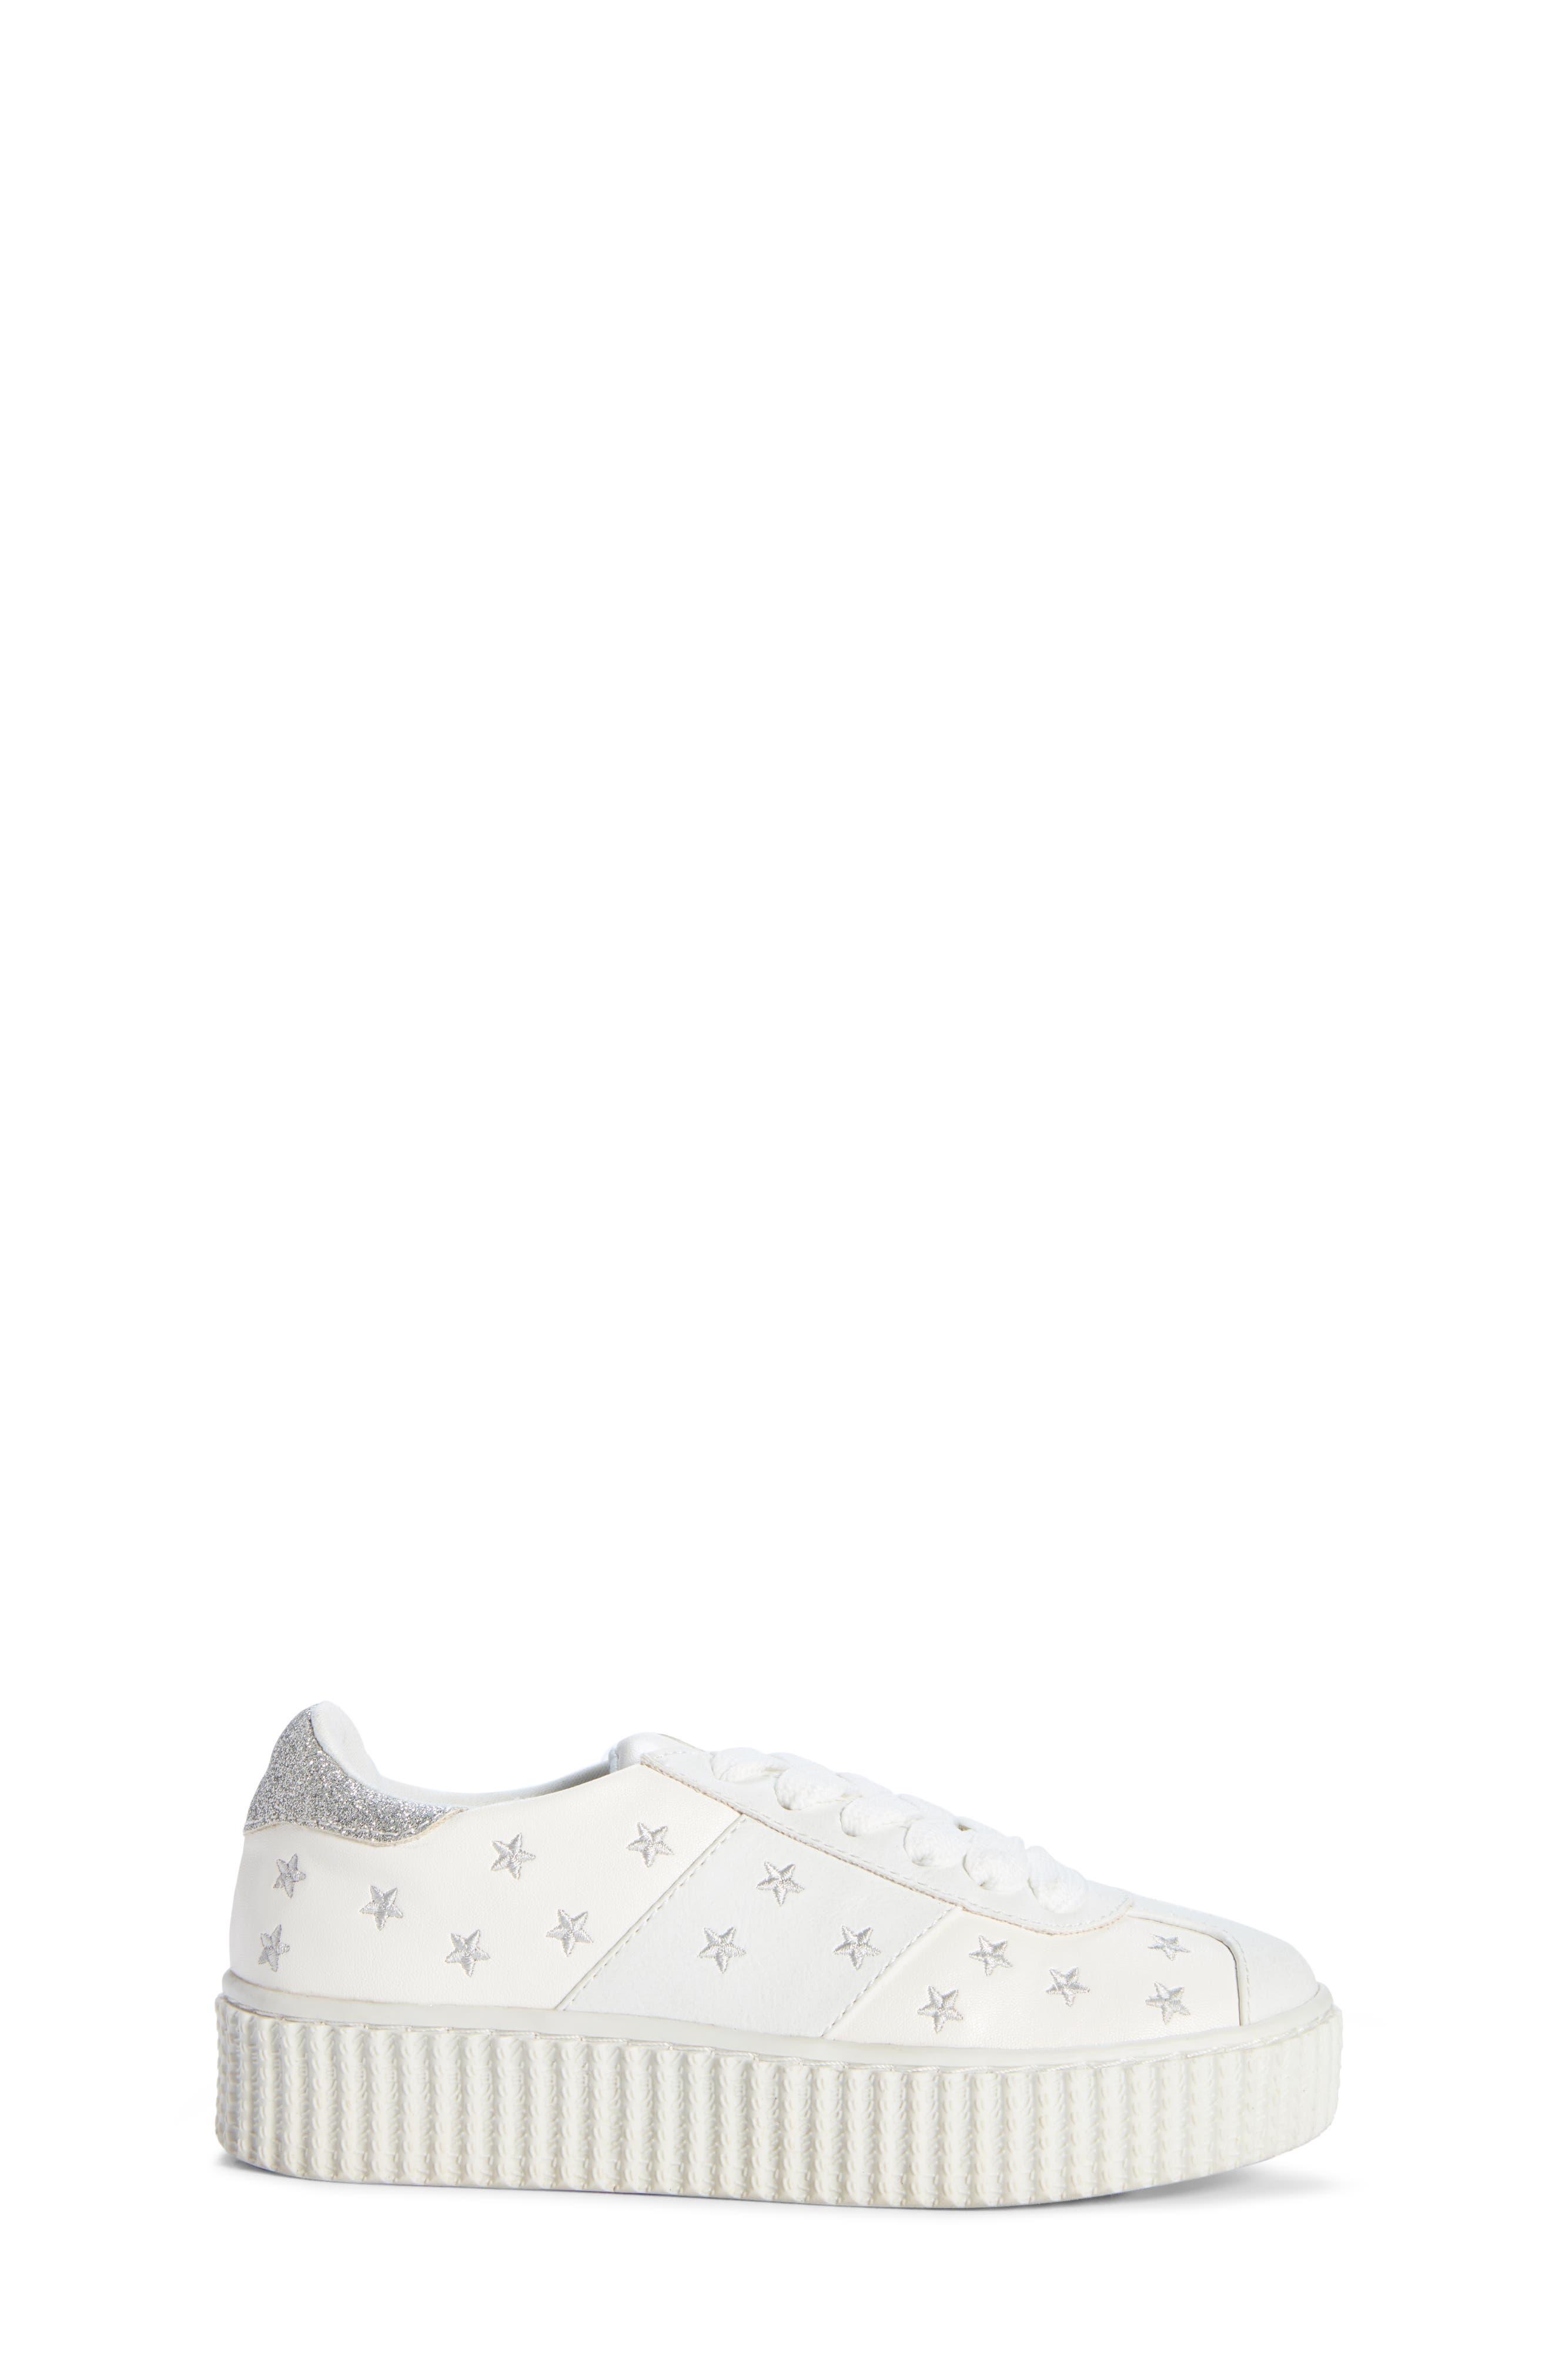 Cadin Star Creeper Sneaker,                             Alternate thumbnail 3, color,                             100